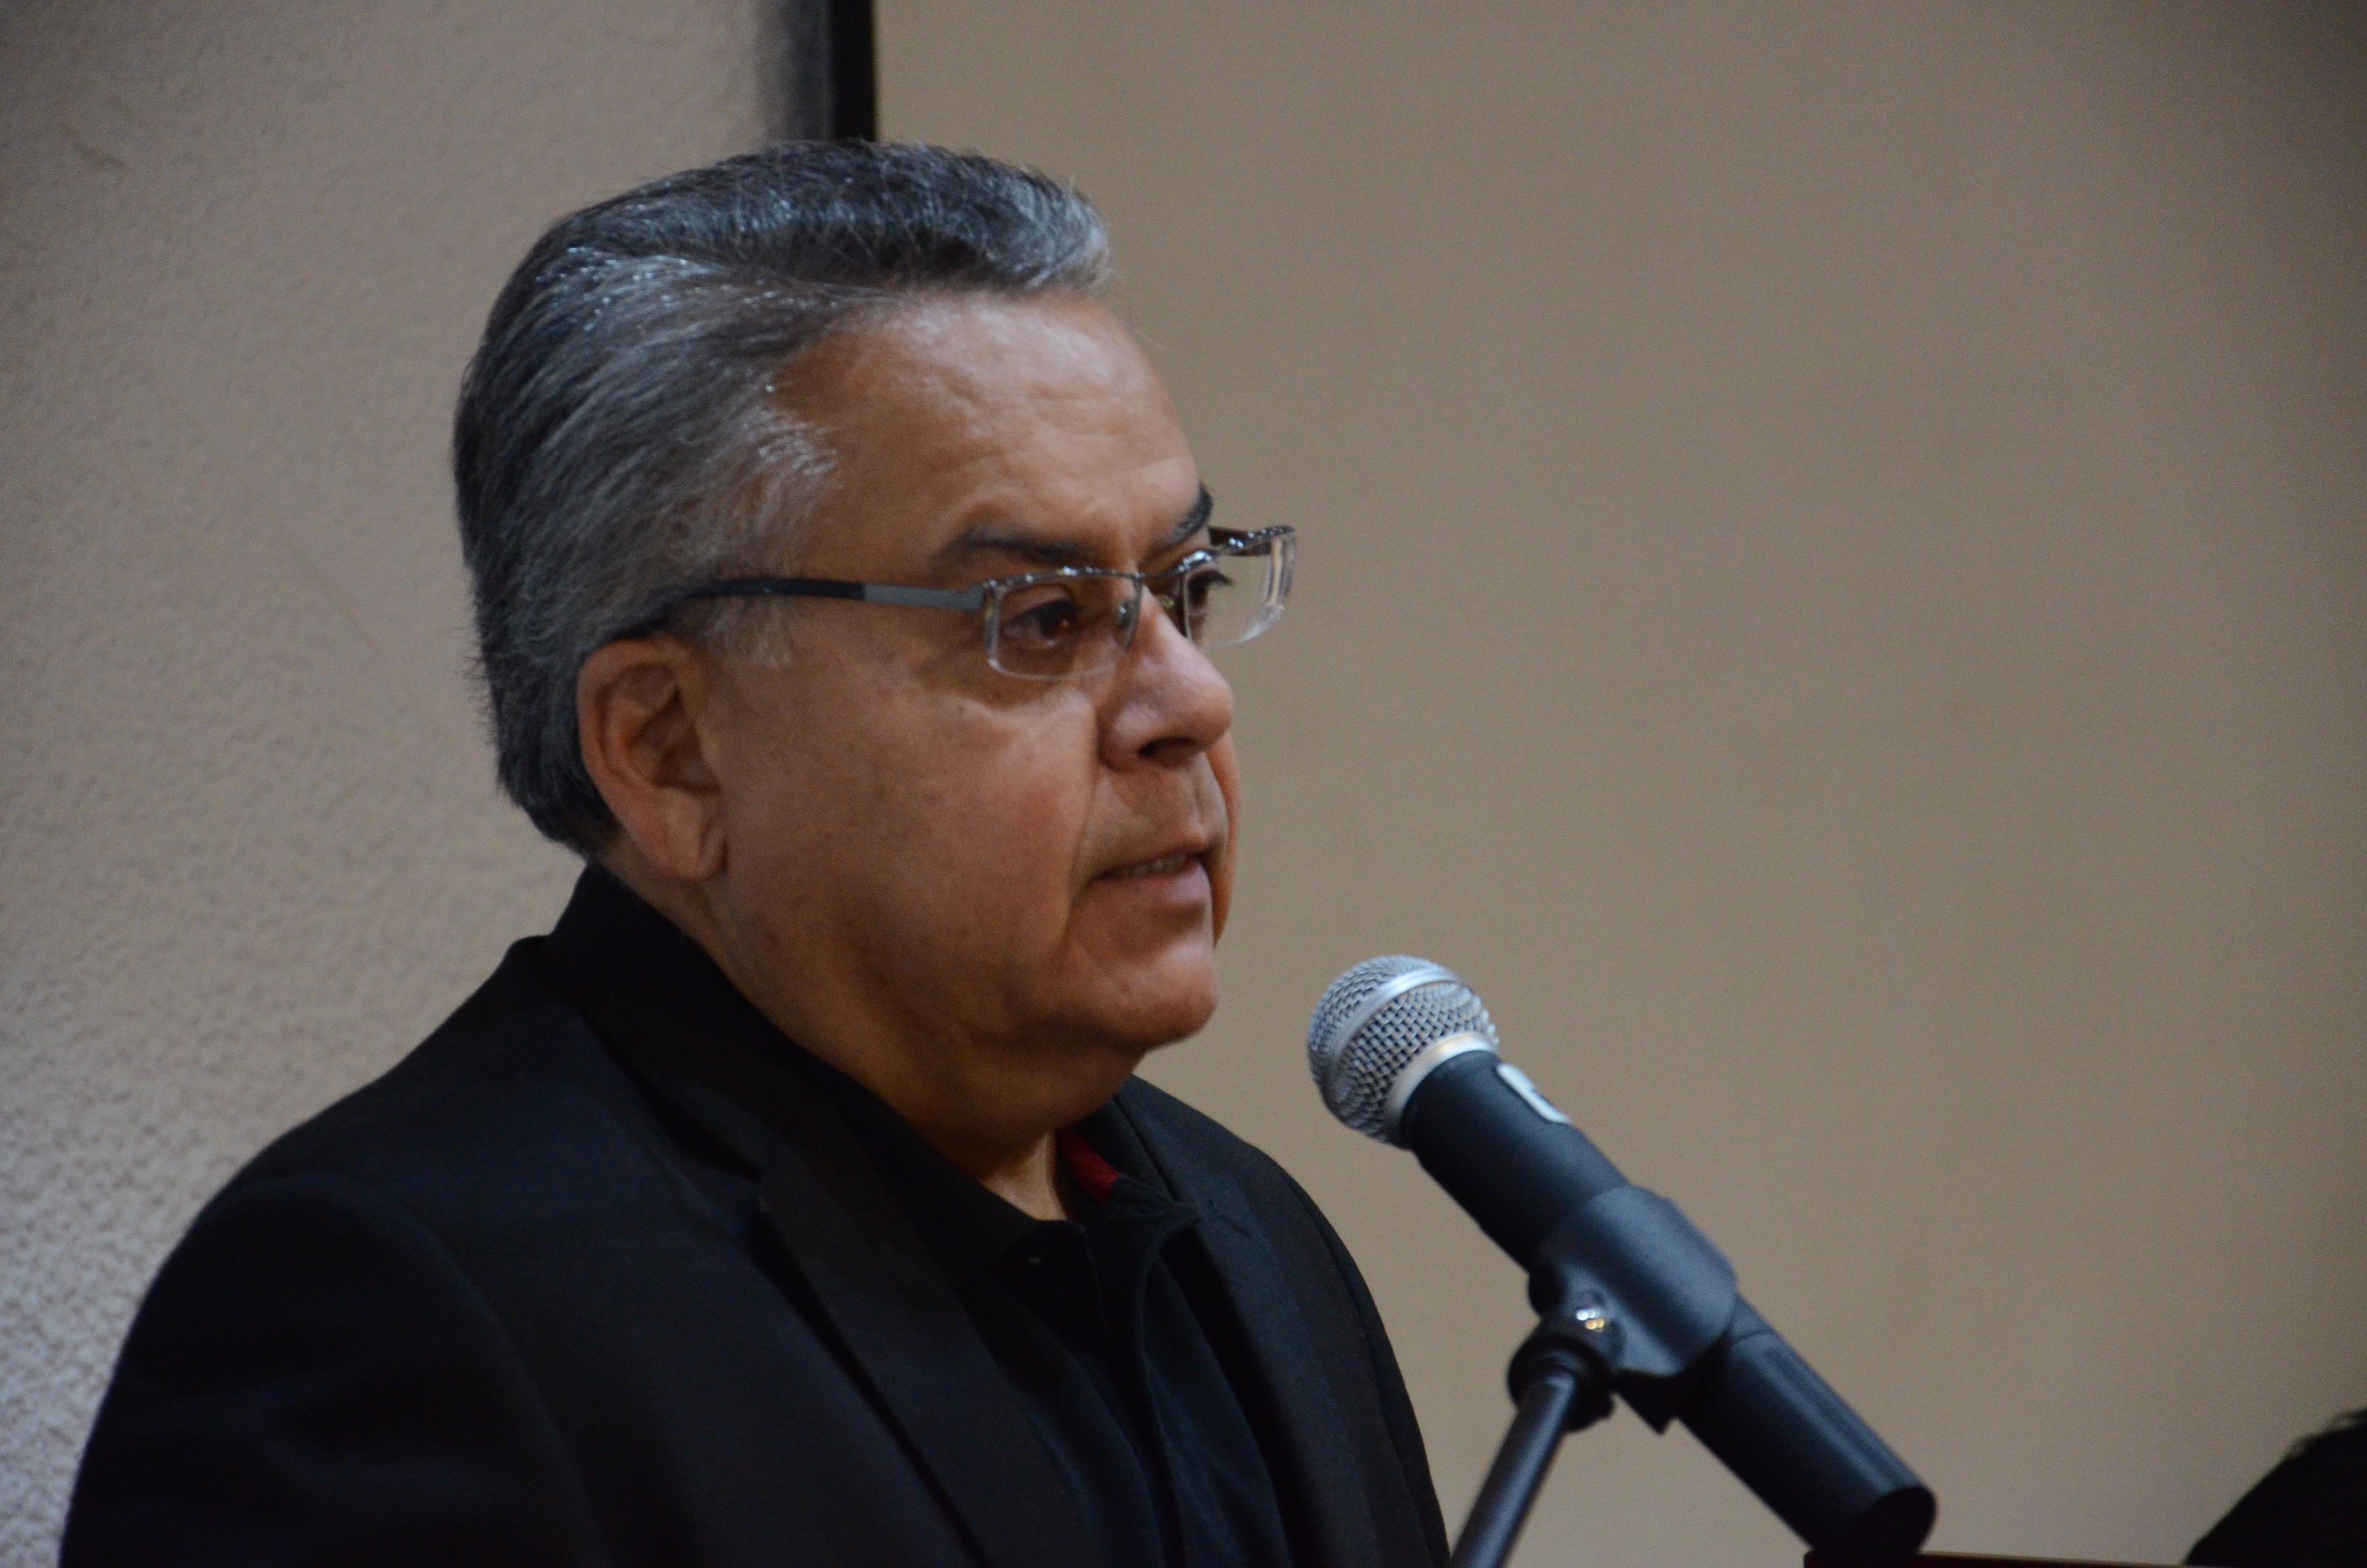 Dr. Salvador Chávez ofrece discurso de despedida